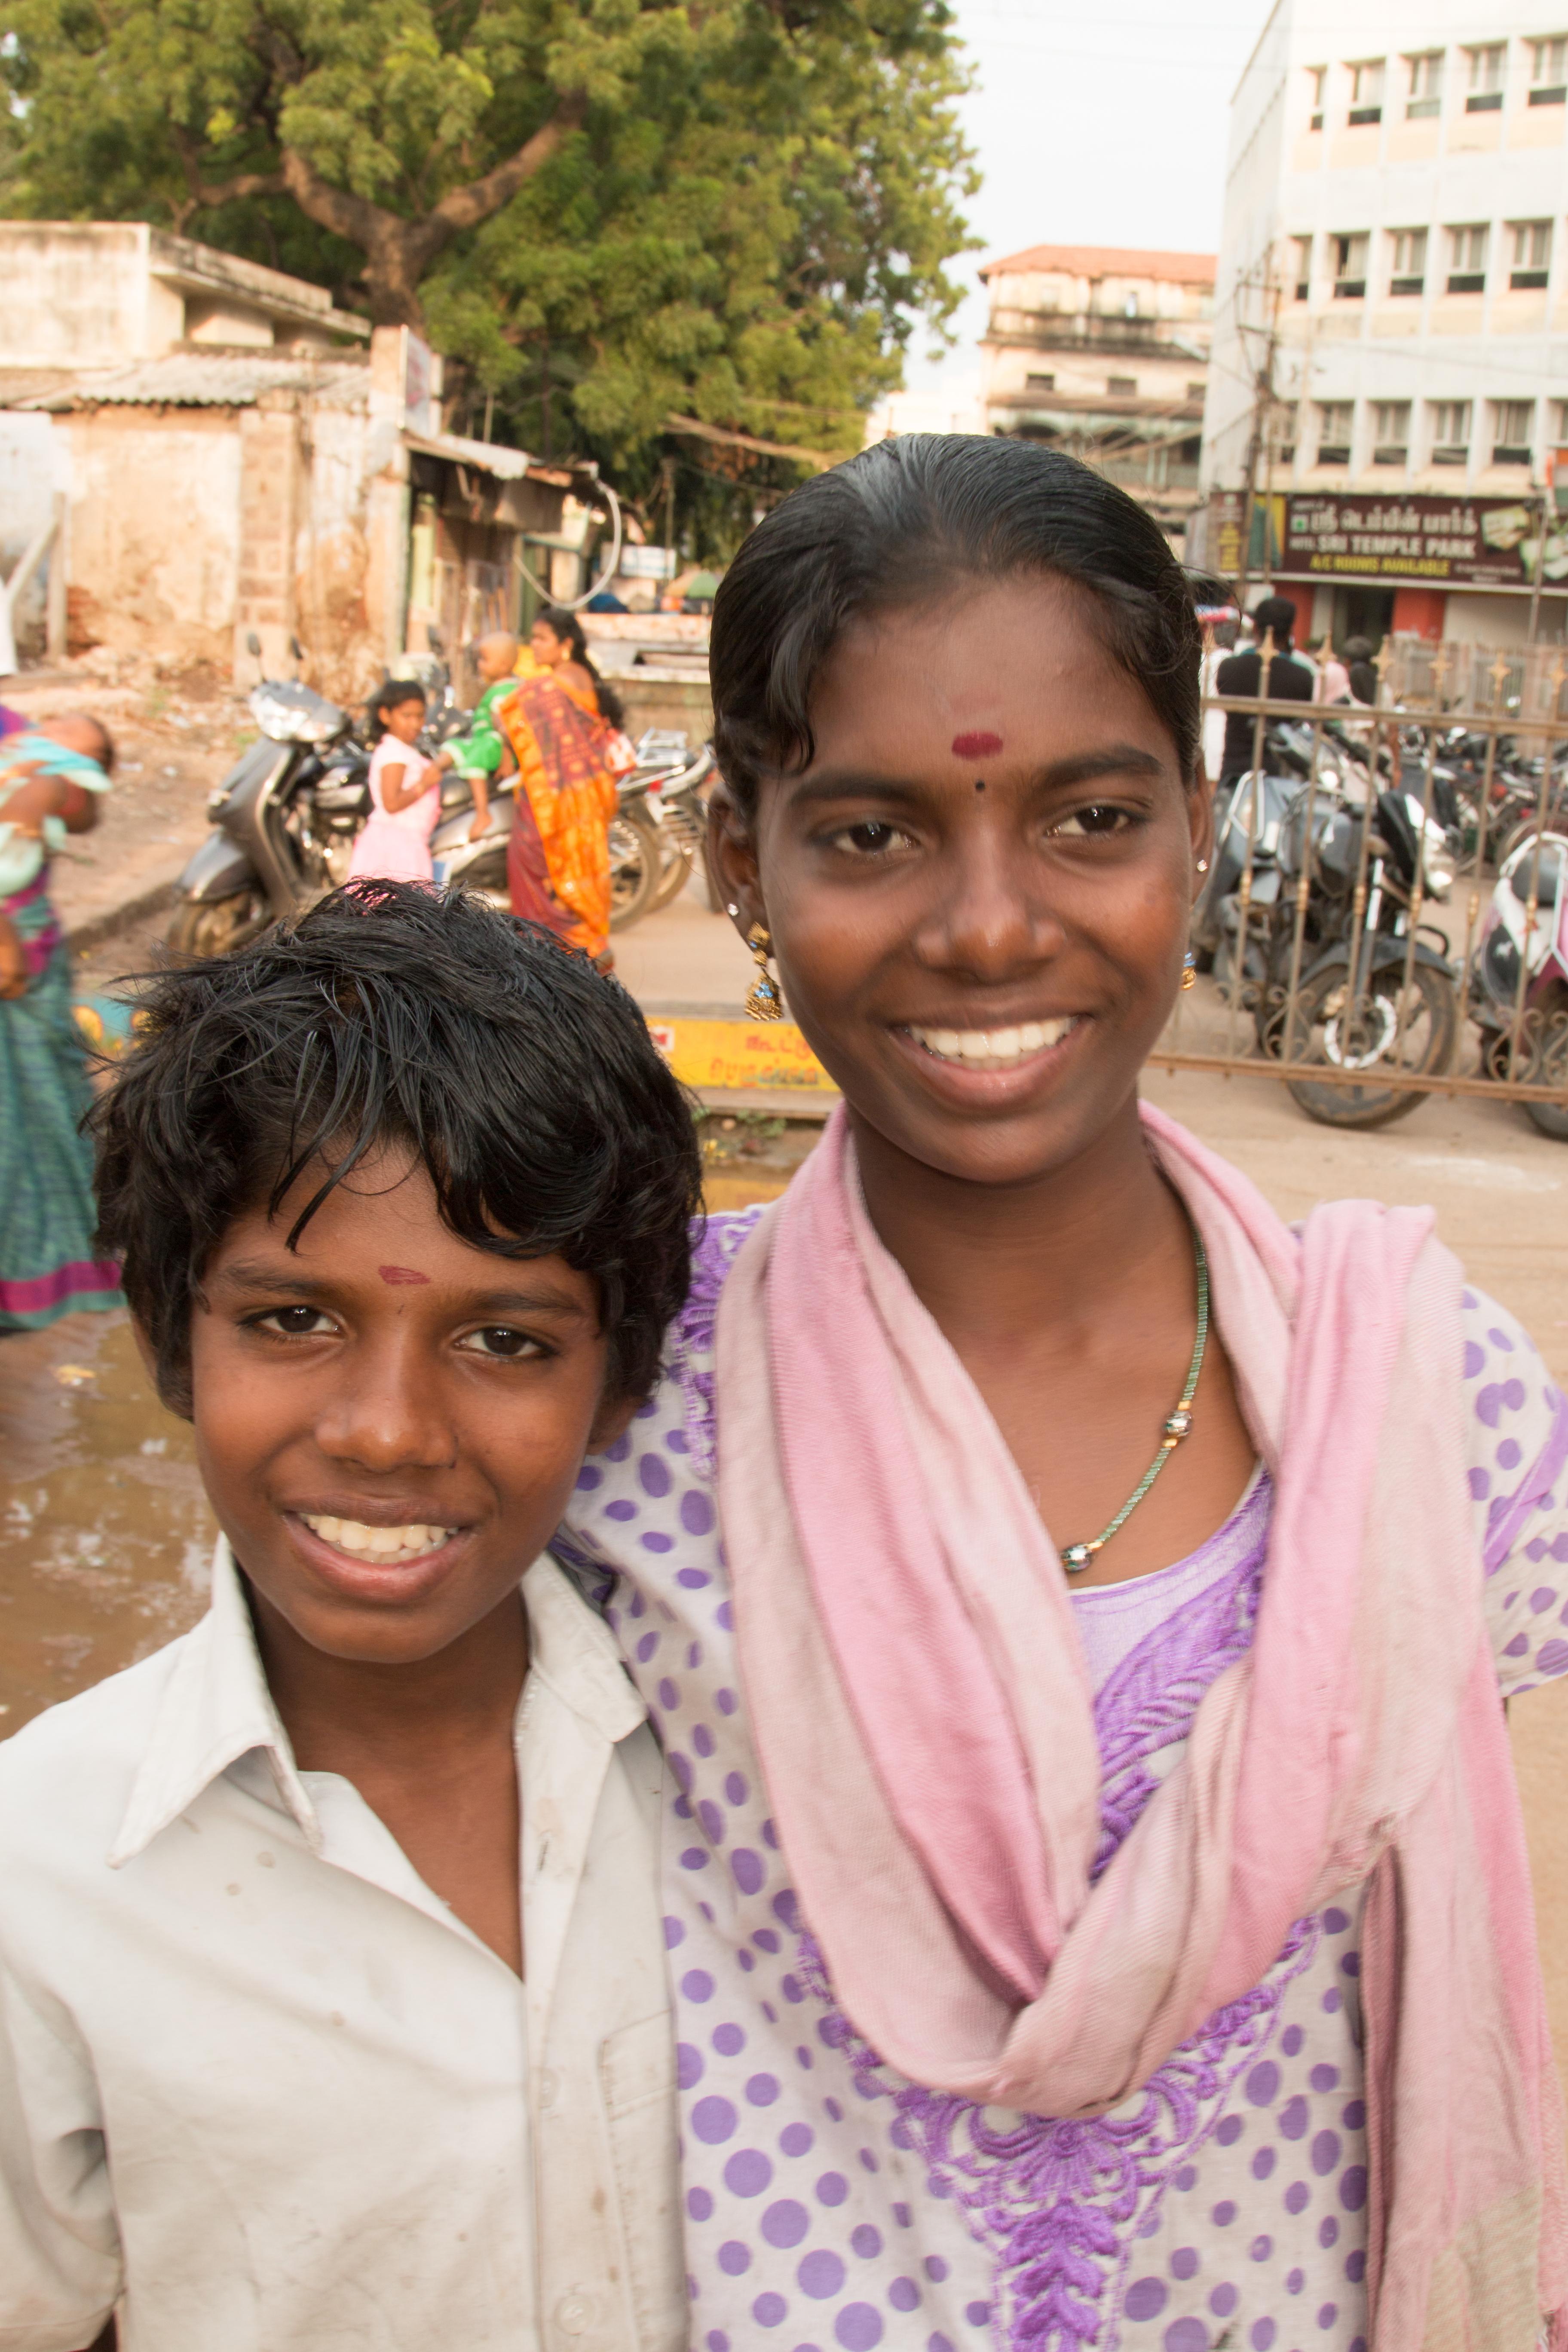 INDIEN Chennai Kanchipuram Tempel Menschen Tempel FINEST-onTour 7813.jpg